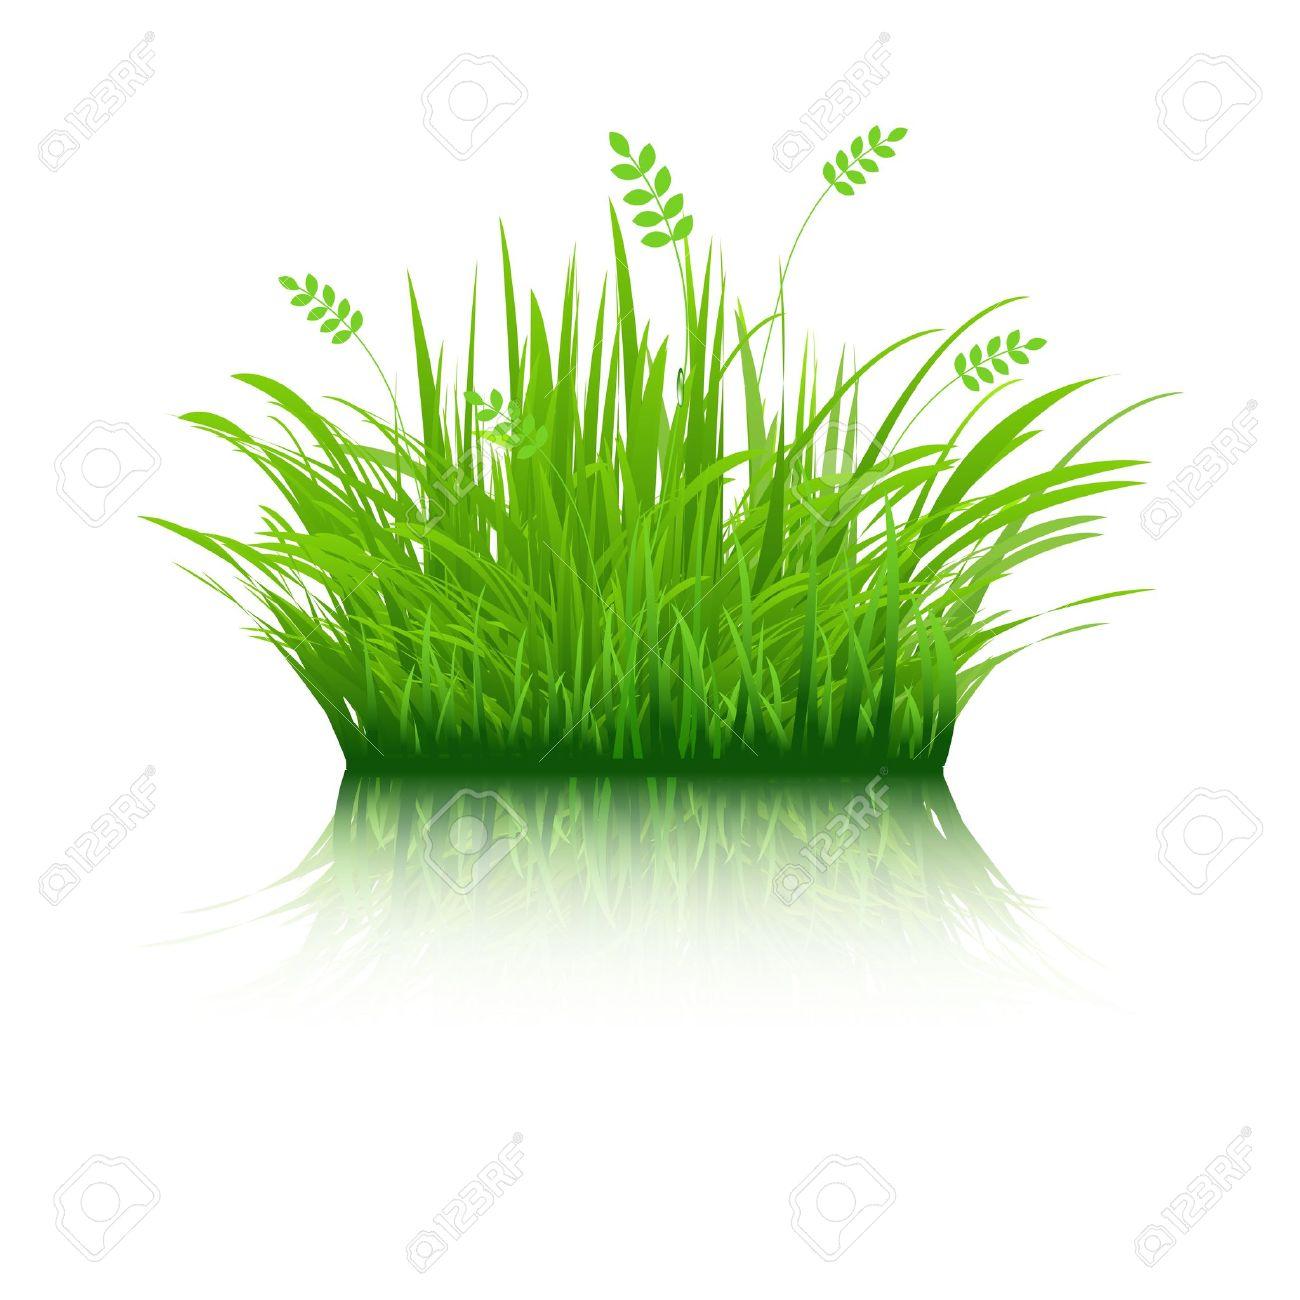 Thin grass clipart clip transparent download Thin Grass Clip Art – Clipart Free Download clip transparent download